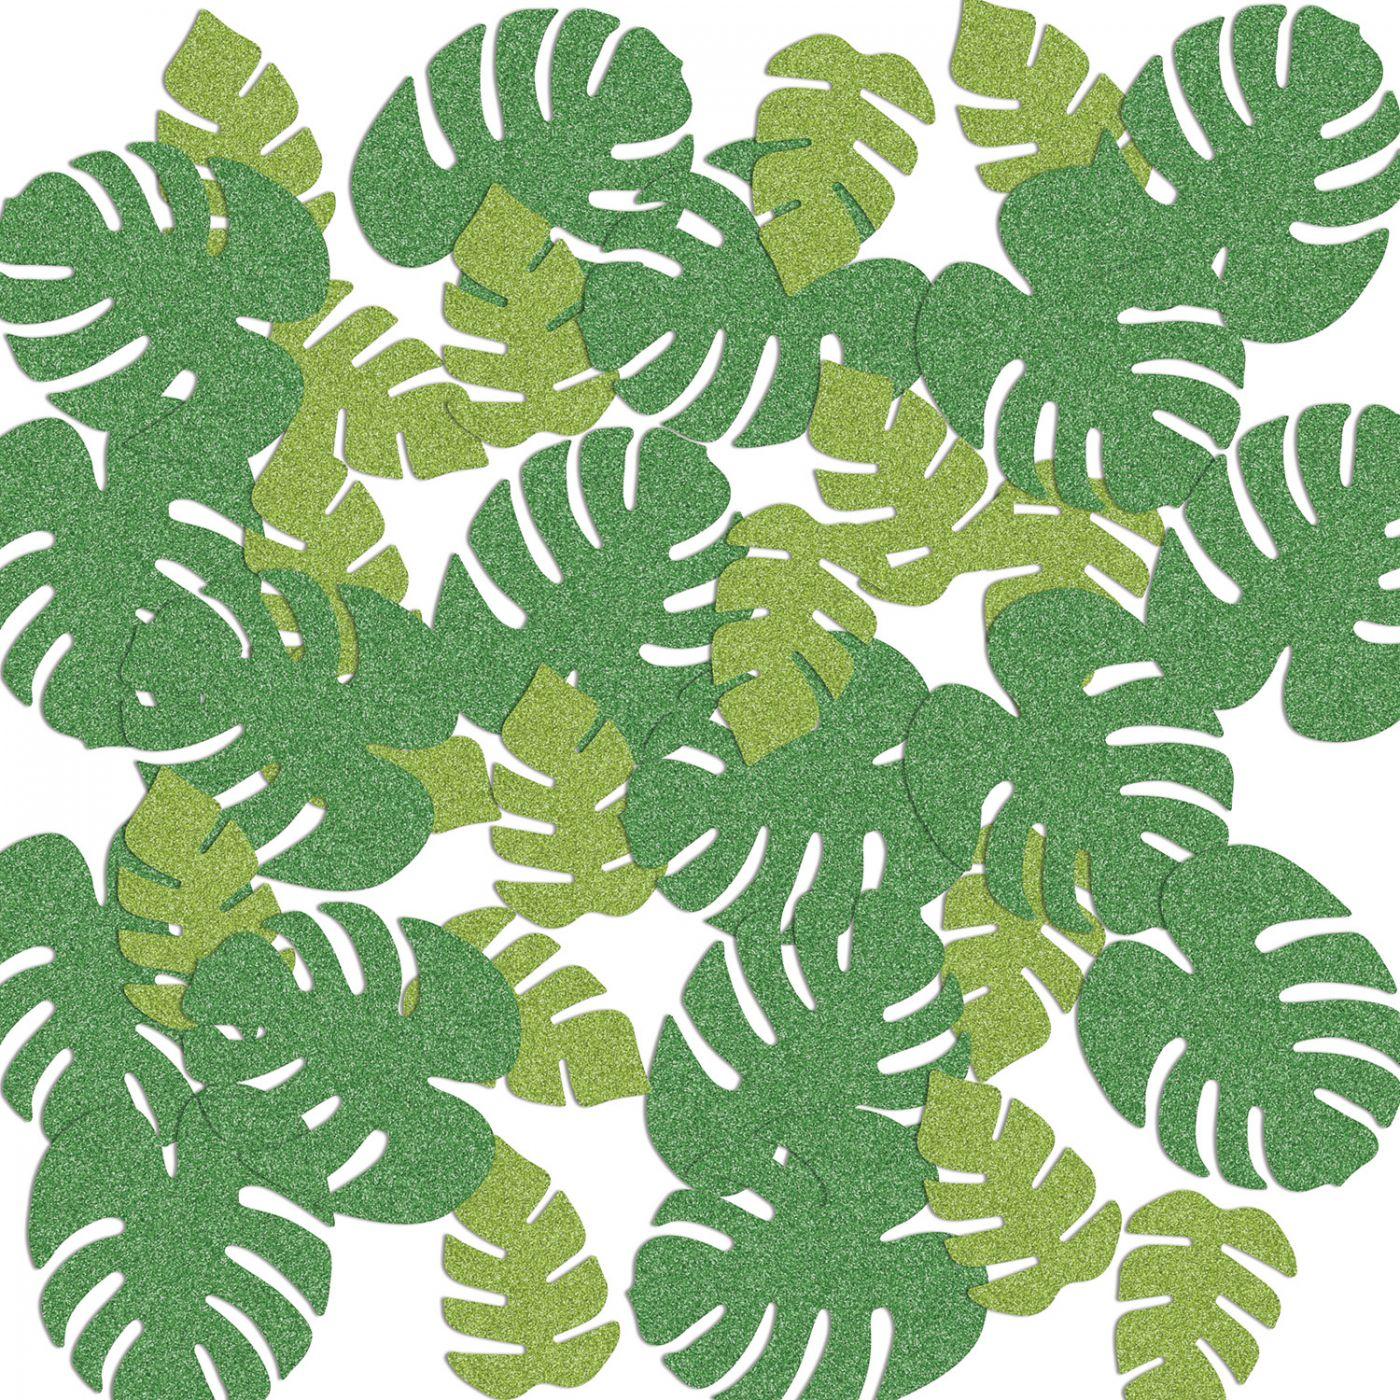 Tropical Palm Leaf Del Sparkle Confetti image